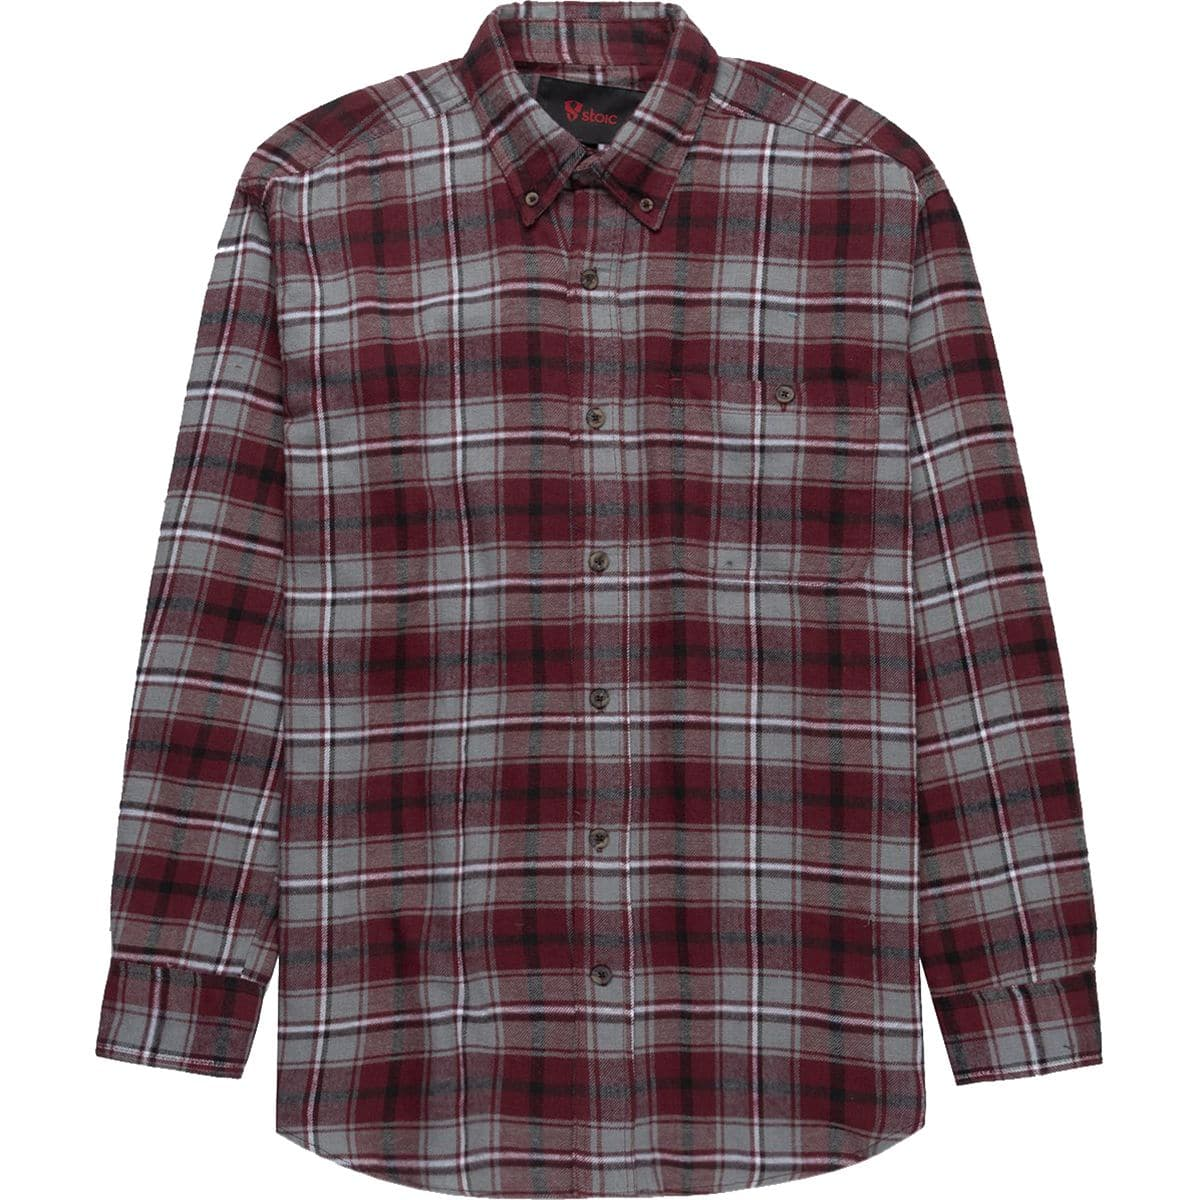 Backcountry Extra 20% Off:Stoic Men's Tenon Flannel Shirt $10.80, Stoic Women's Spacedye Hooded Fleece Jacket $14.40 & More + Free Shipping $50+